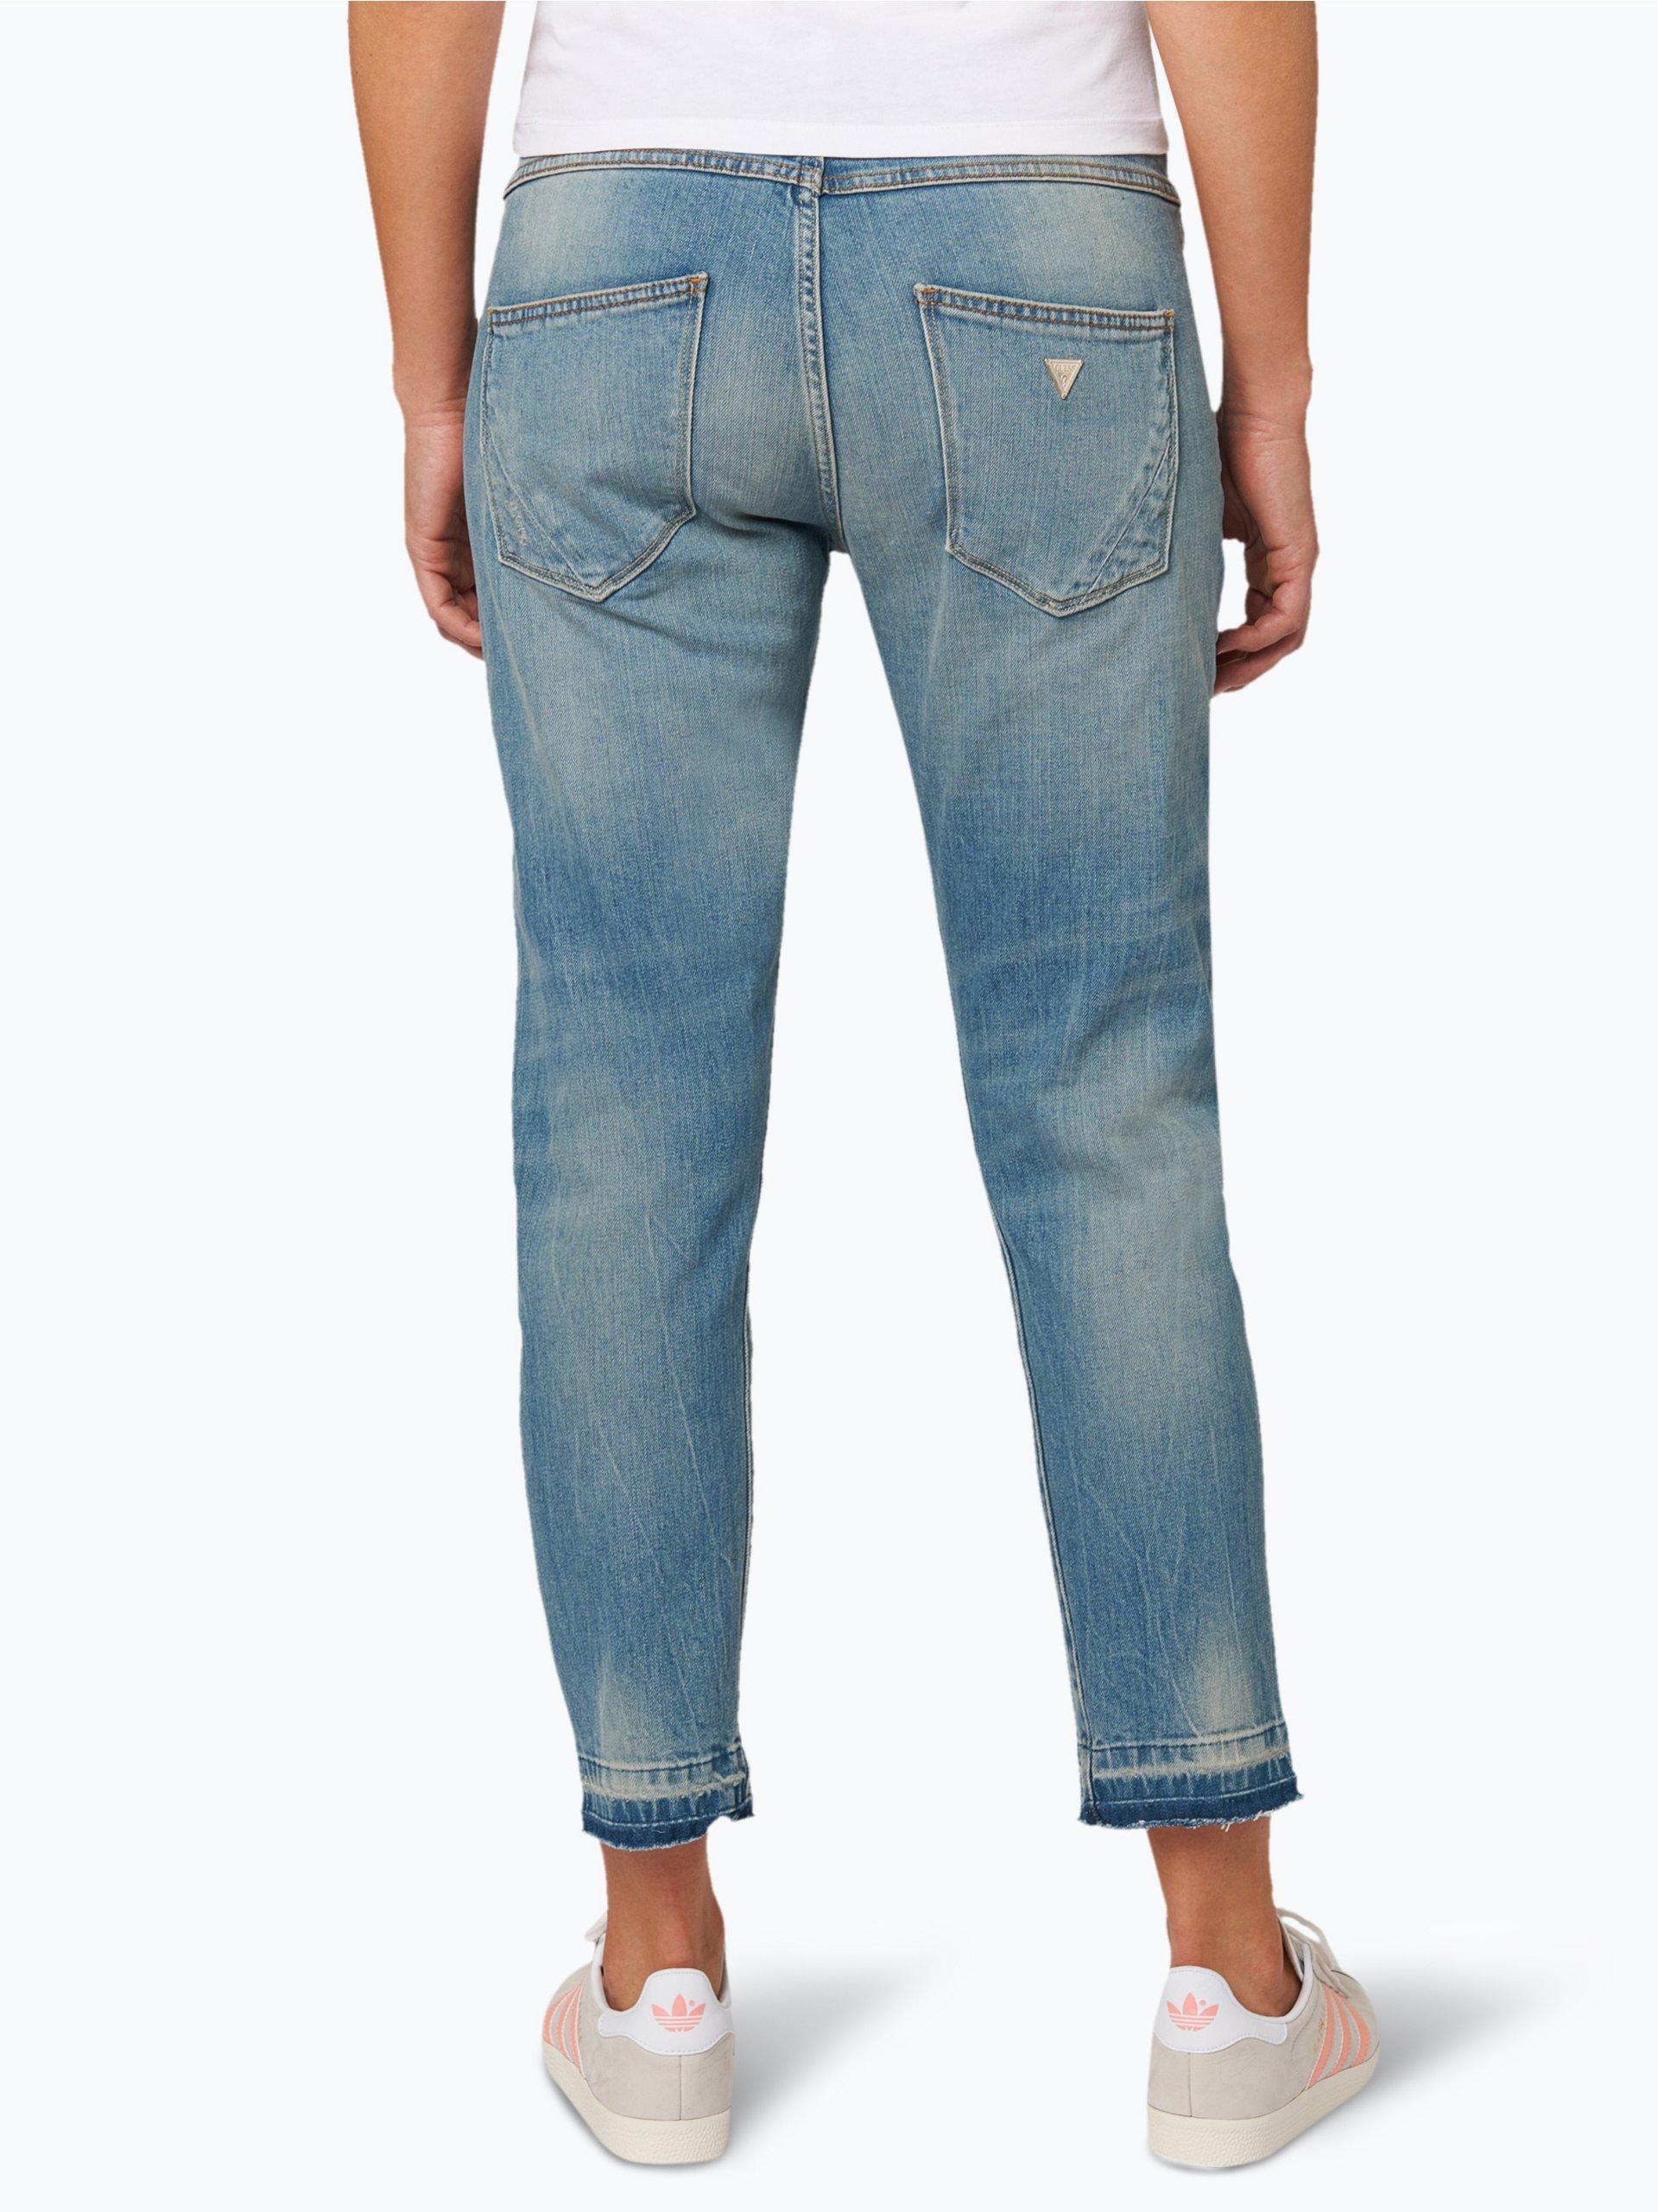 1066dde718f1e Guess Jeans Jeansy damskie – Ragd kup online